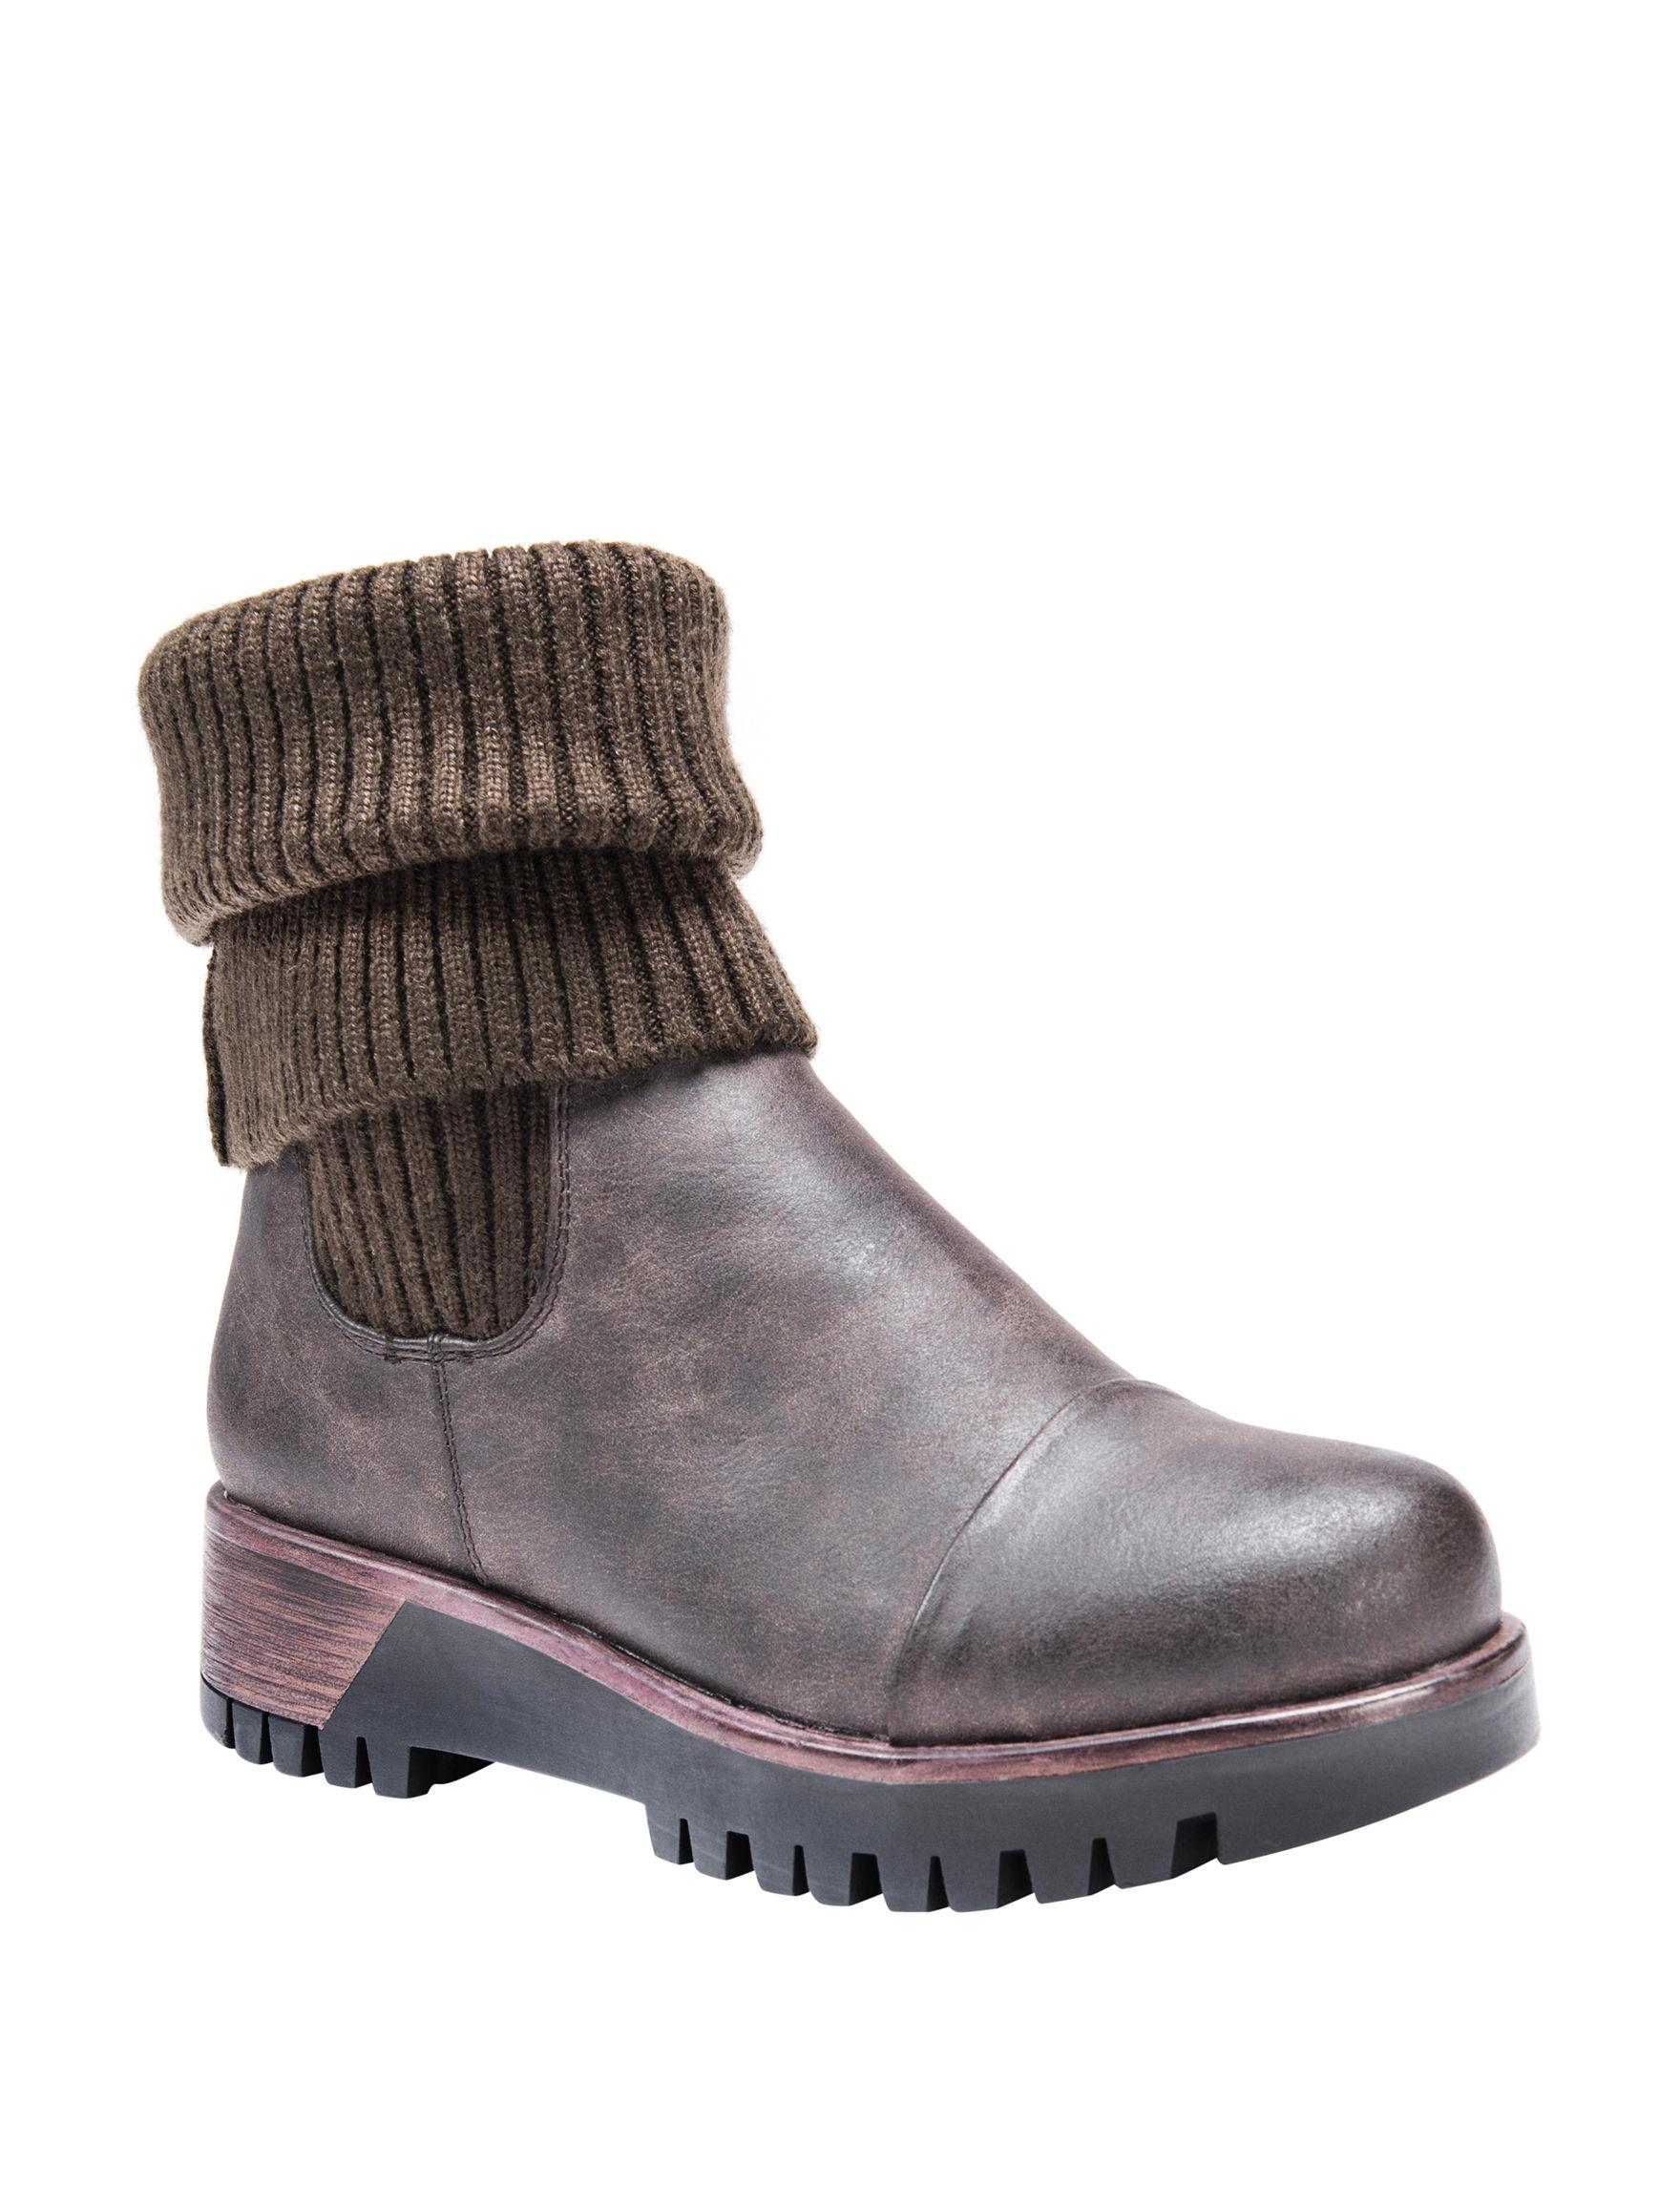 Muk Luks Chestnut Winter Boots